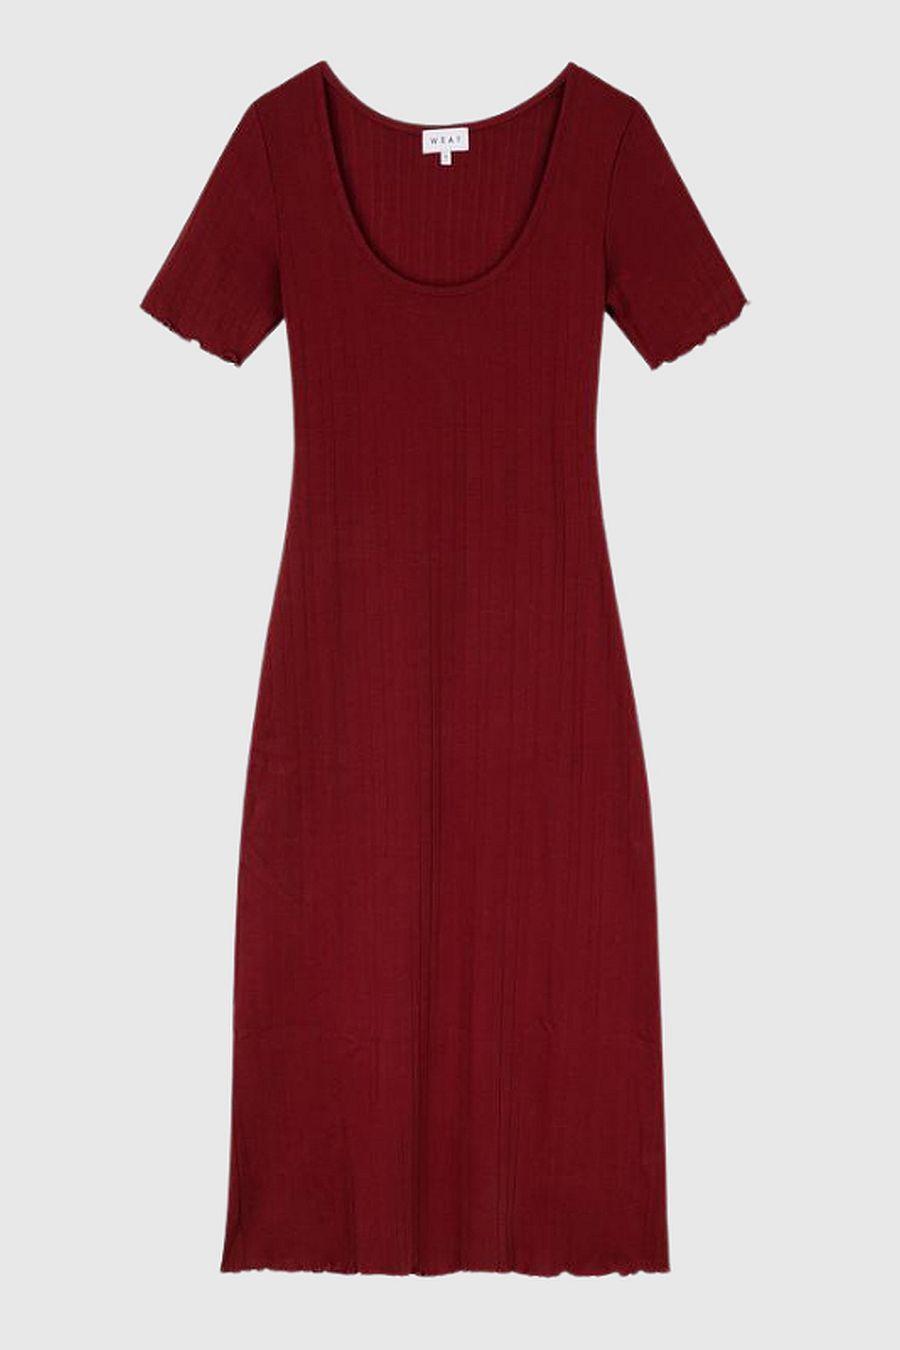 Wray NYC Keller Dress - Port